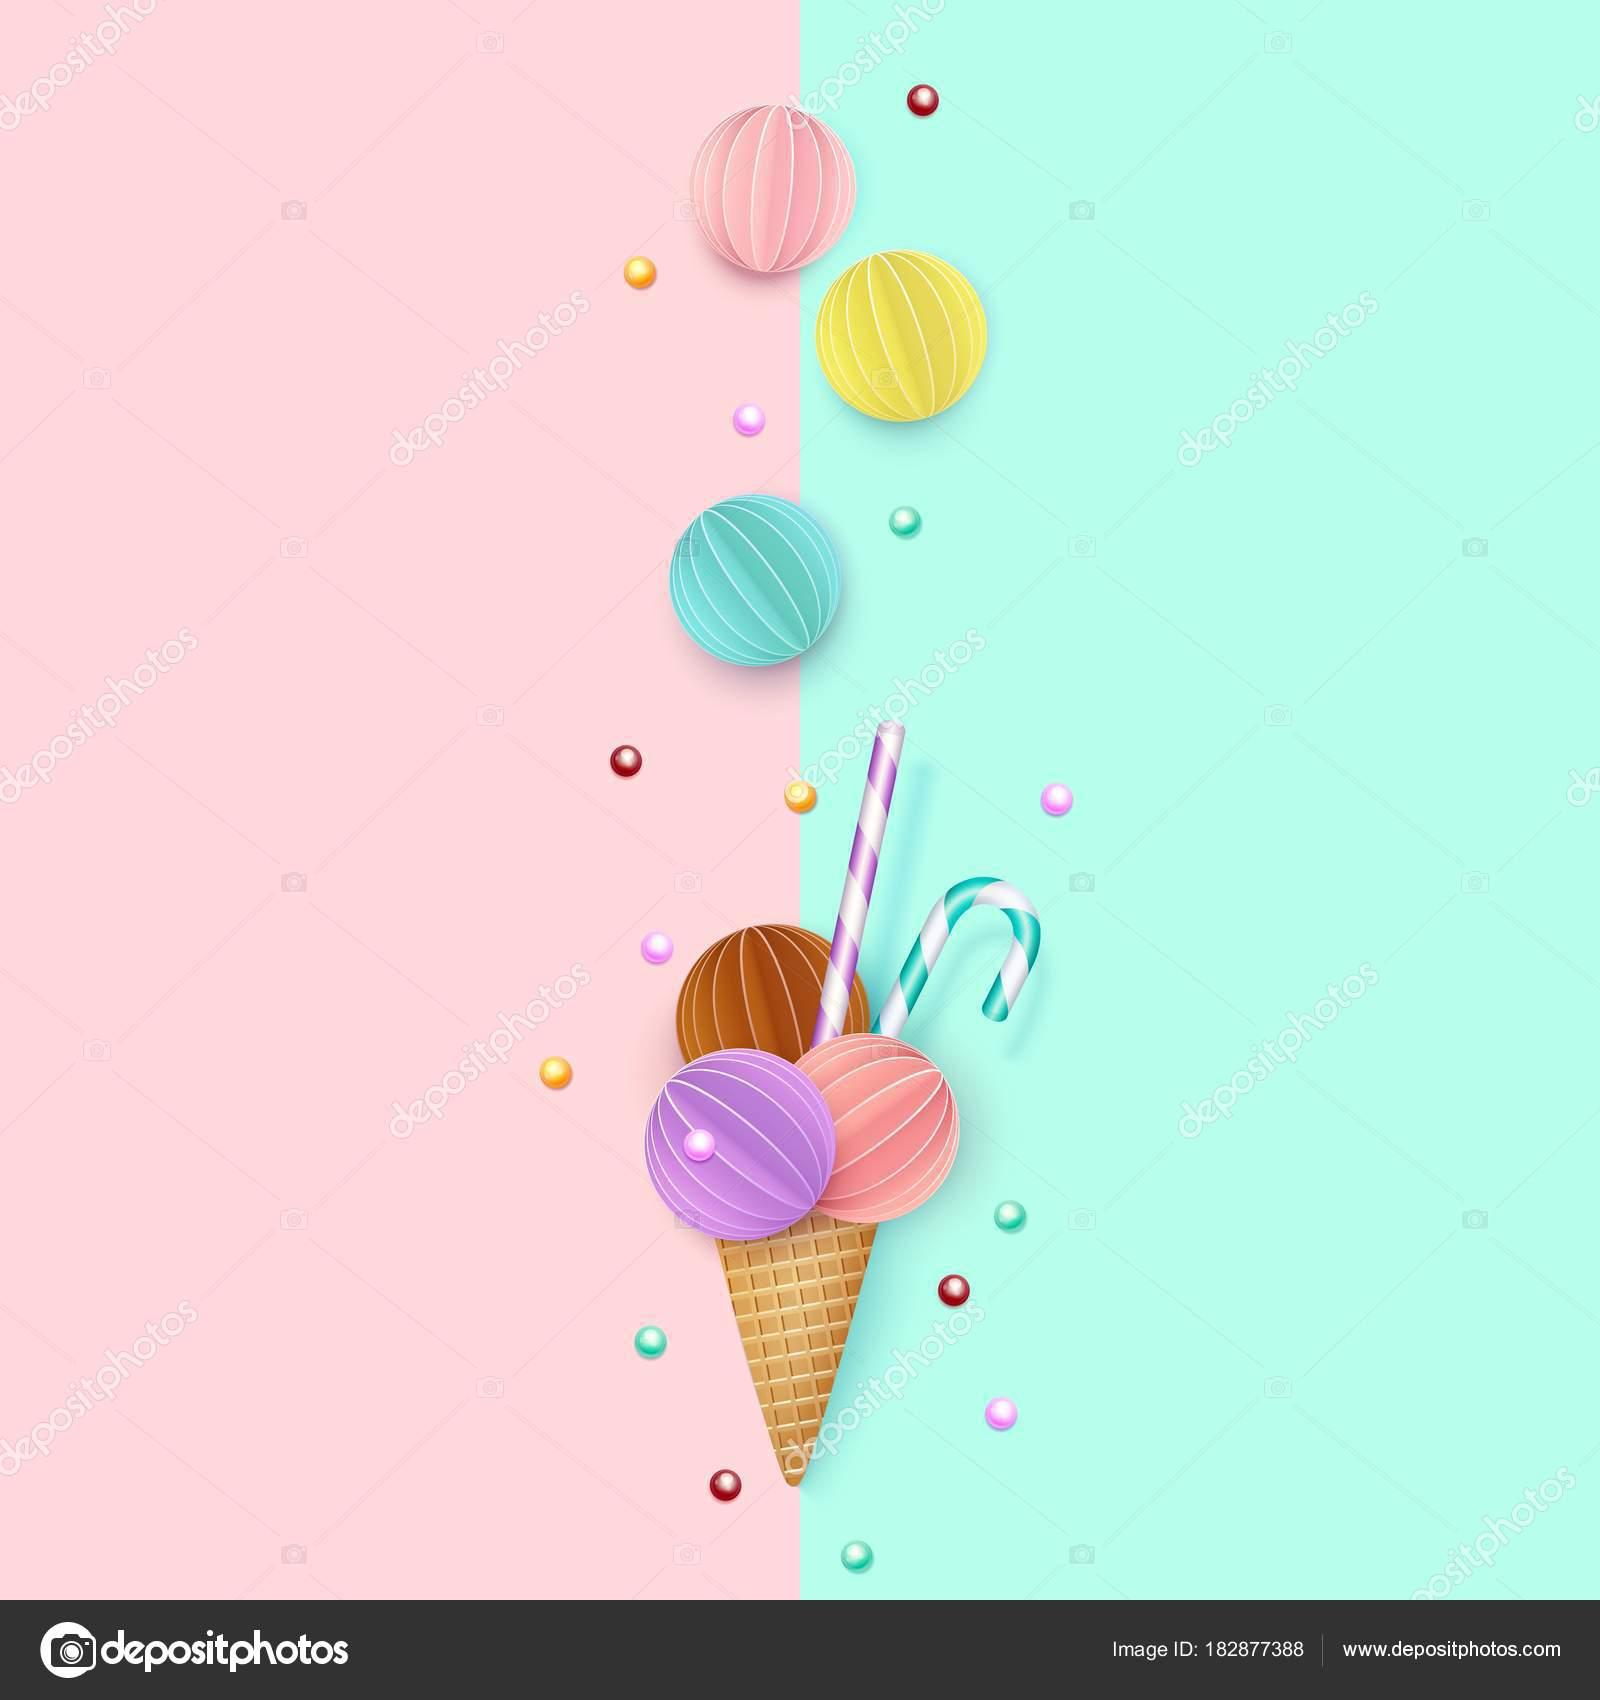 Ice Cream Cone Wallpaper: Ice Cream Cone, Background, 3D, Pastel. Paper Cut Style